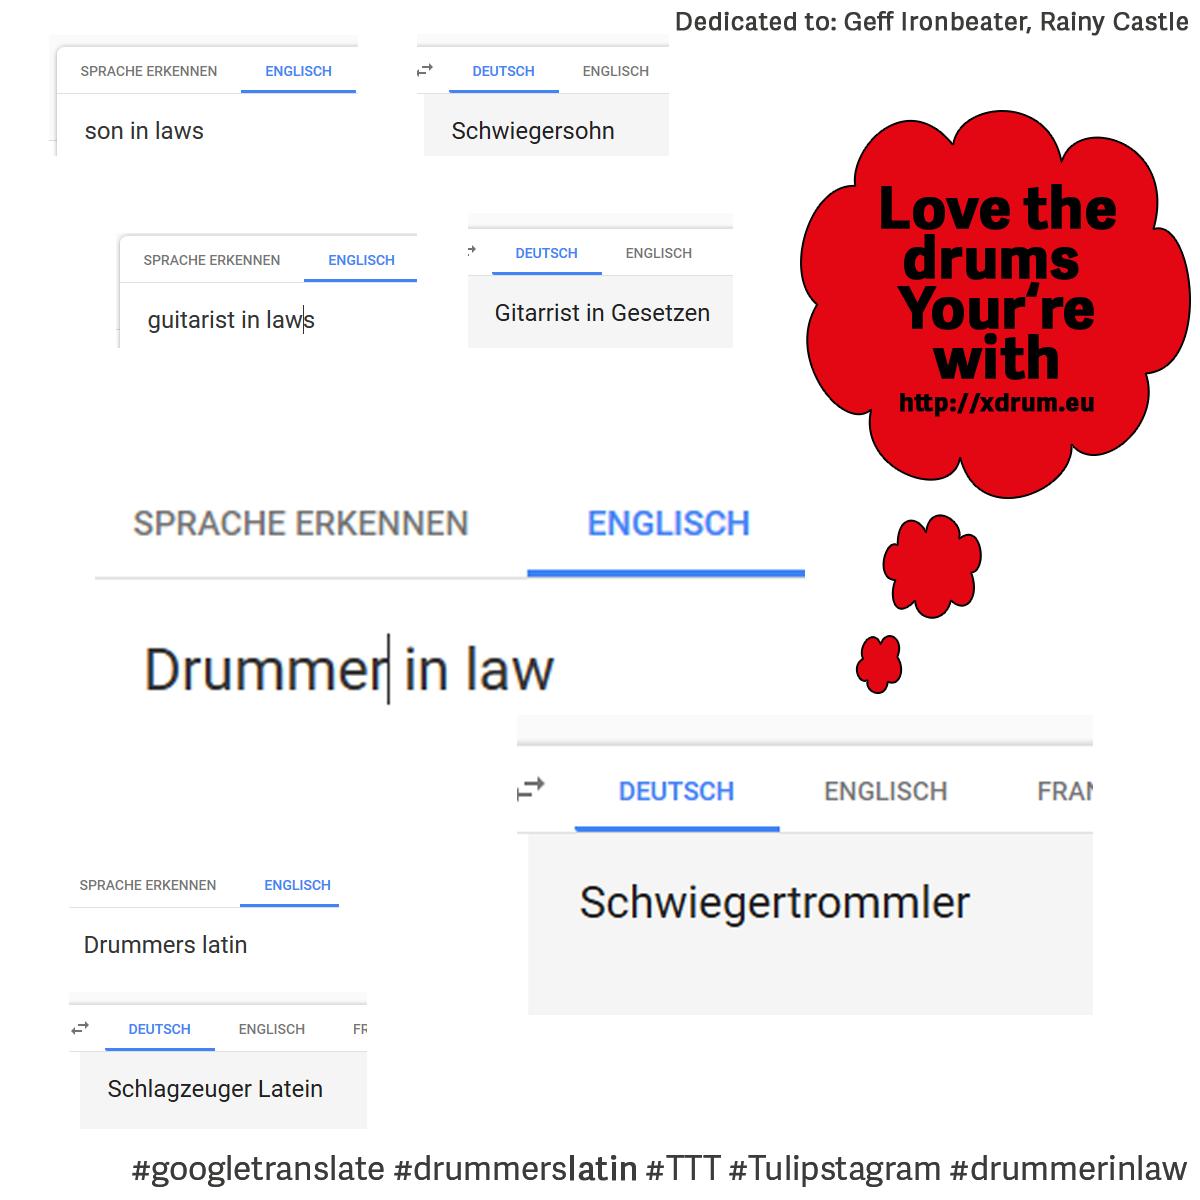 Son in laws - guitarist in laws - Drummer in law #googletranslate #drummerslatin #TTT #Tulipstagram #drummerinlaw